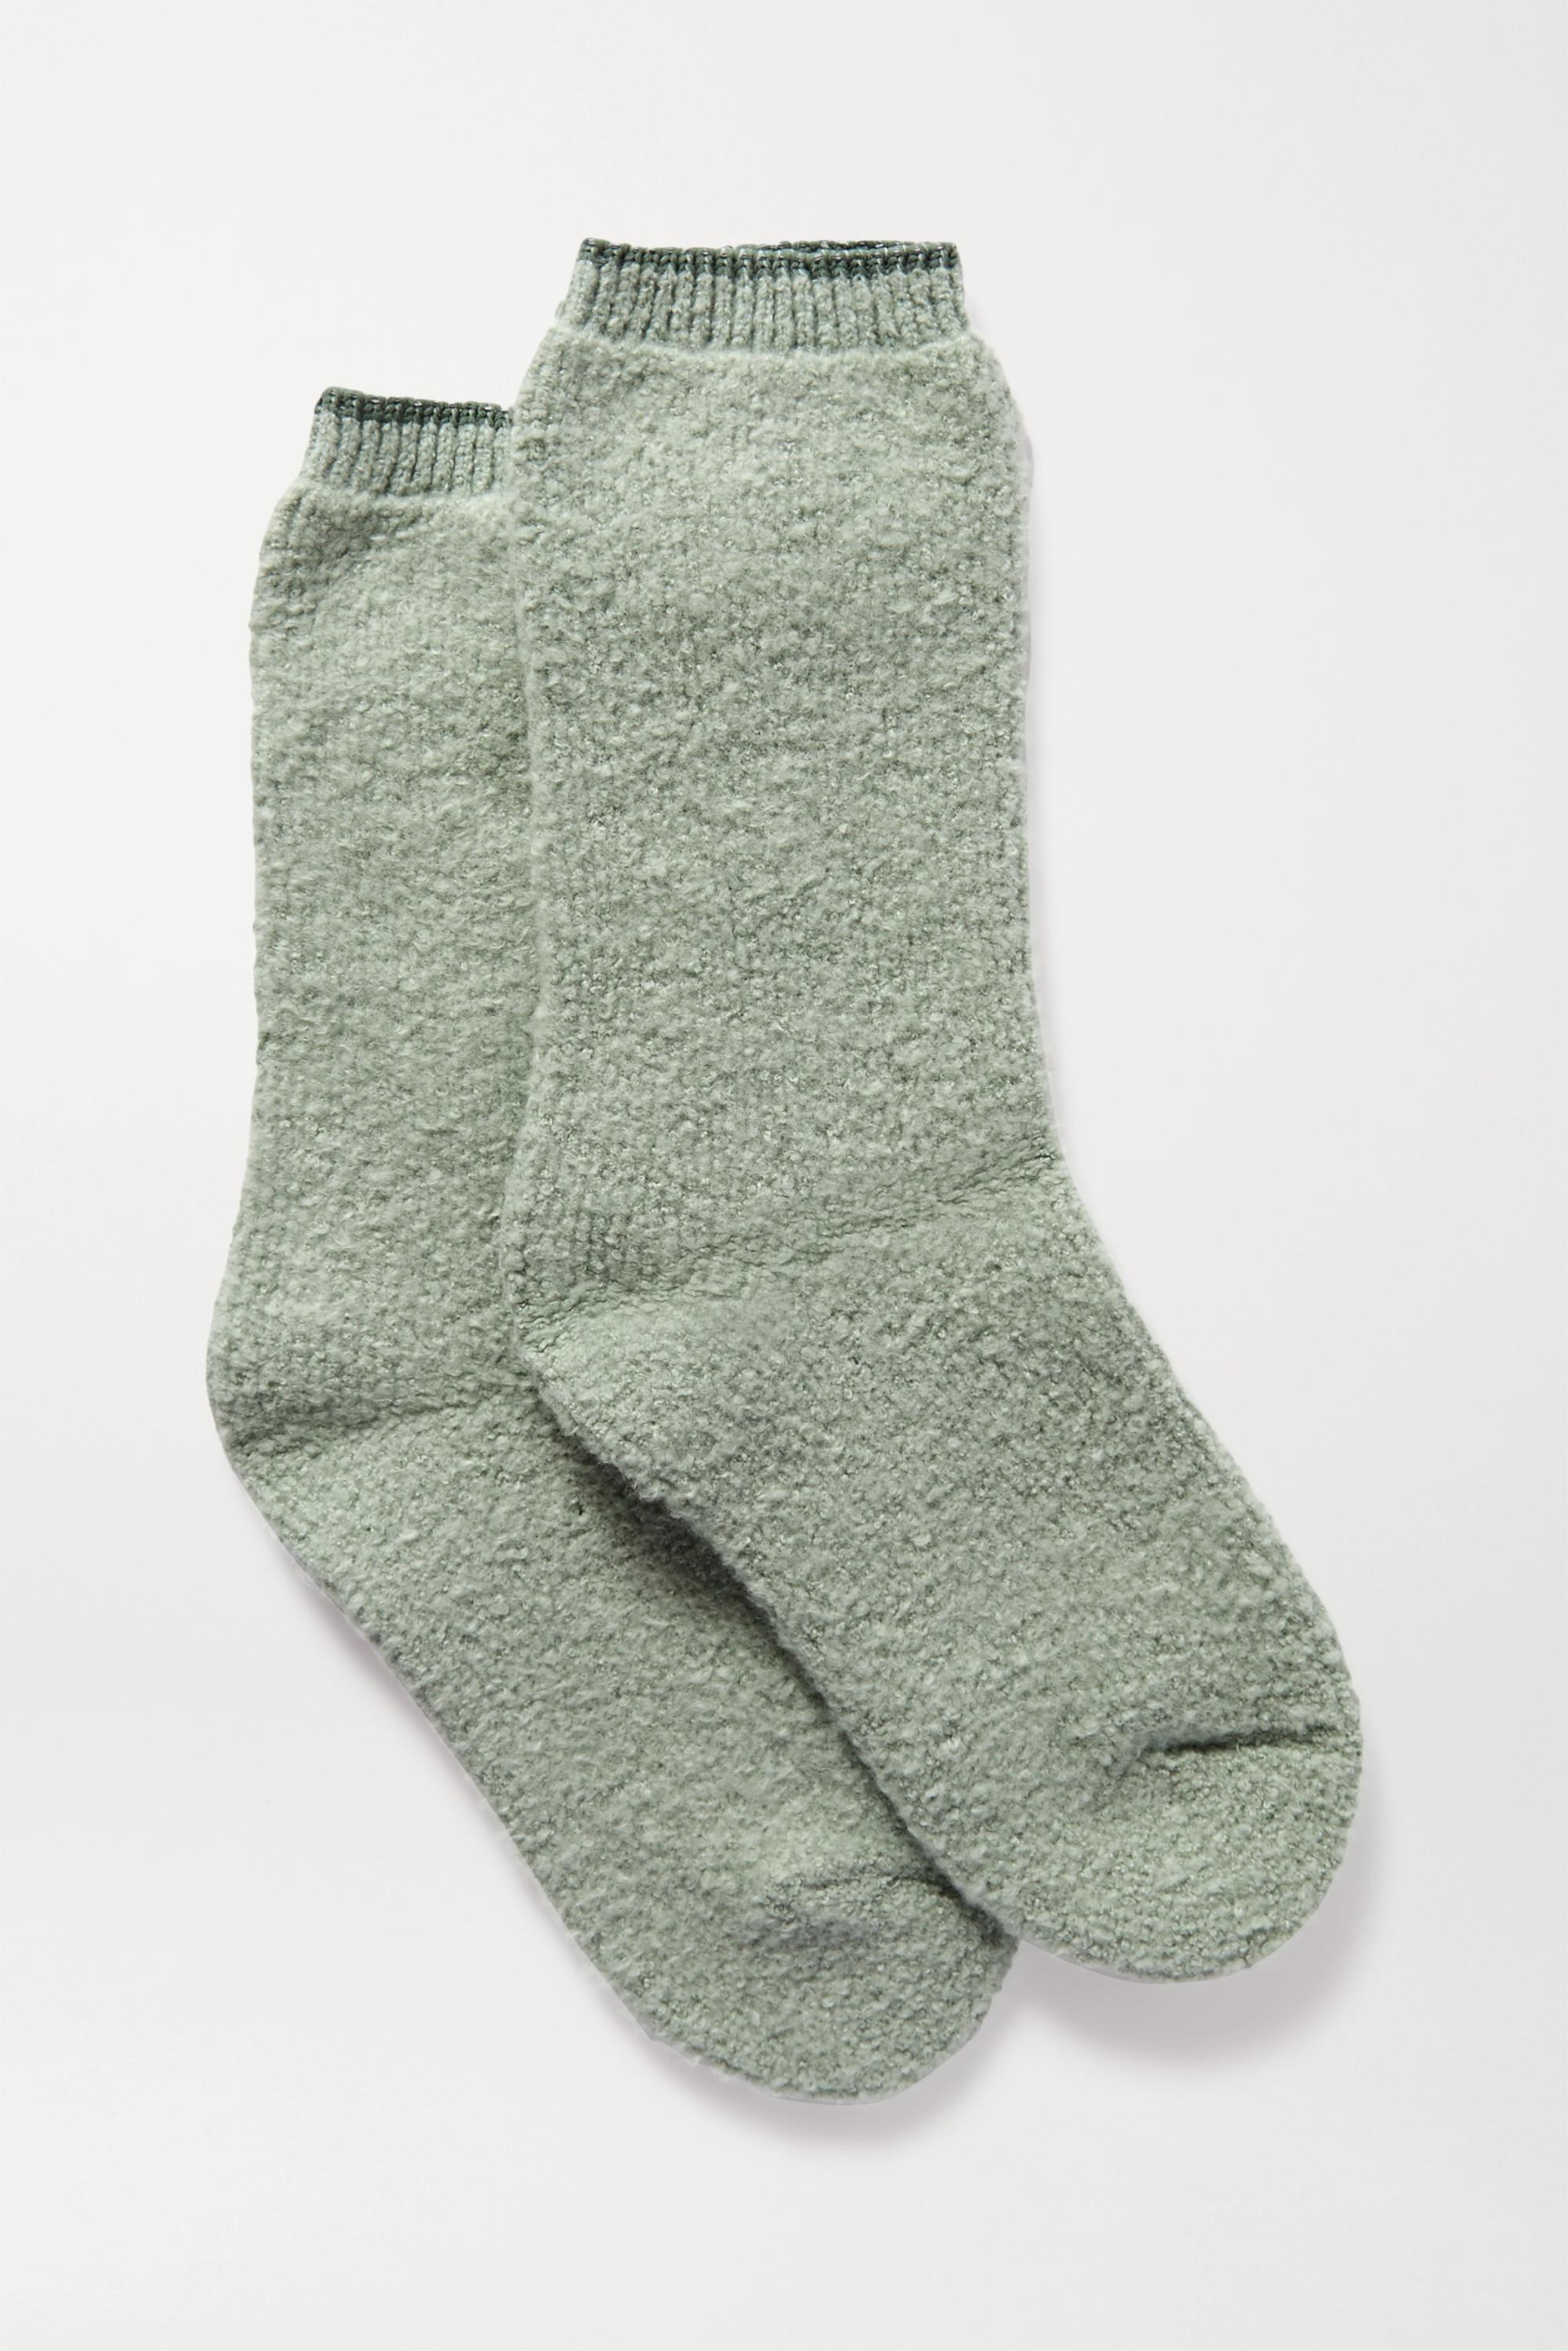 FALKE Plush Touch reversible cotton-blend socks